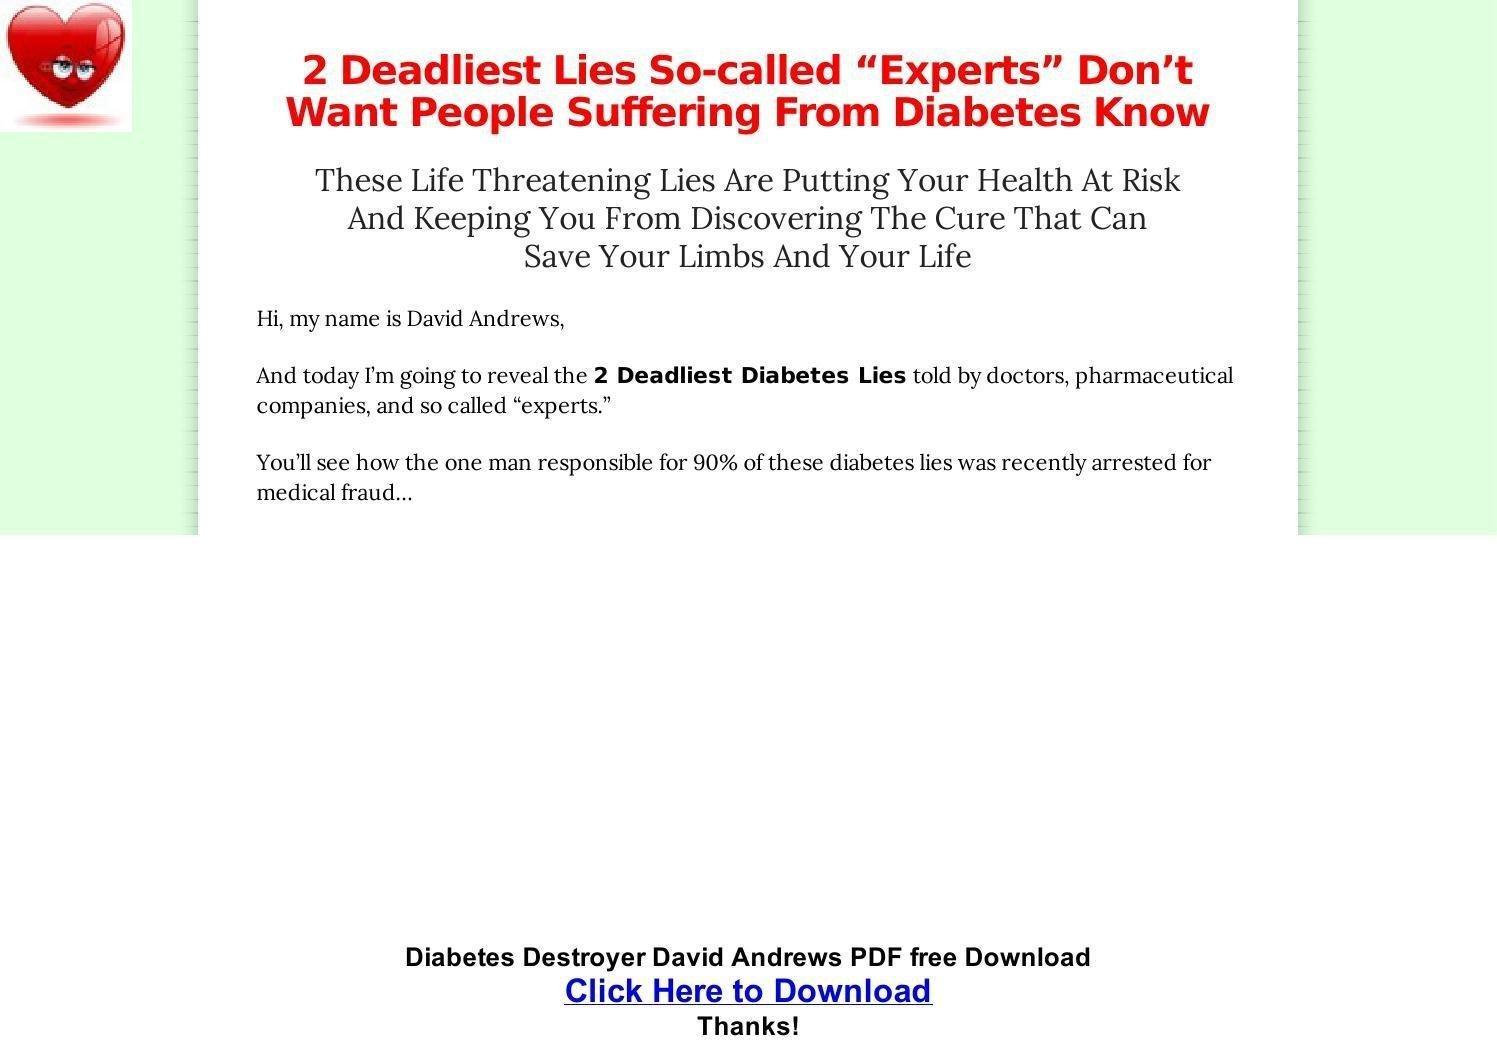 Diabetes Destroyer David Andrews Pdf Free Download By Marie Kelly - Issuu